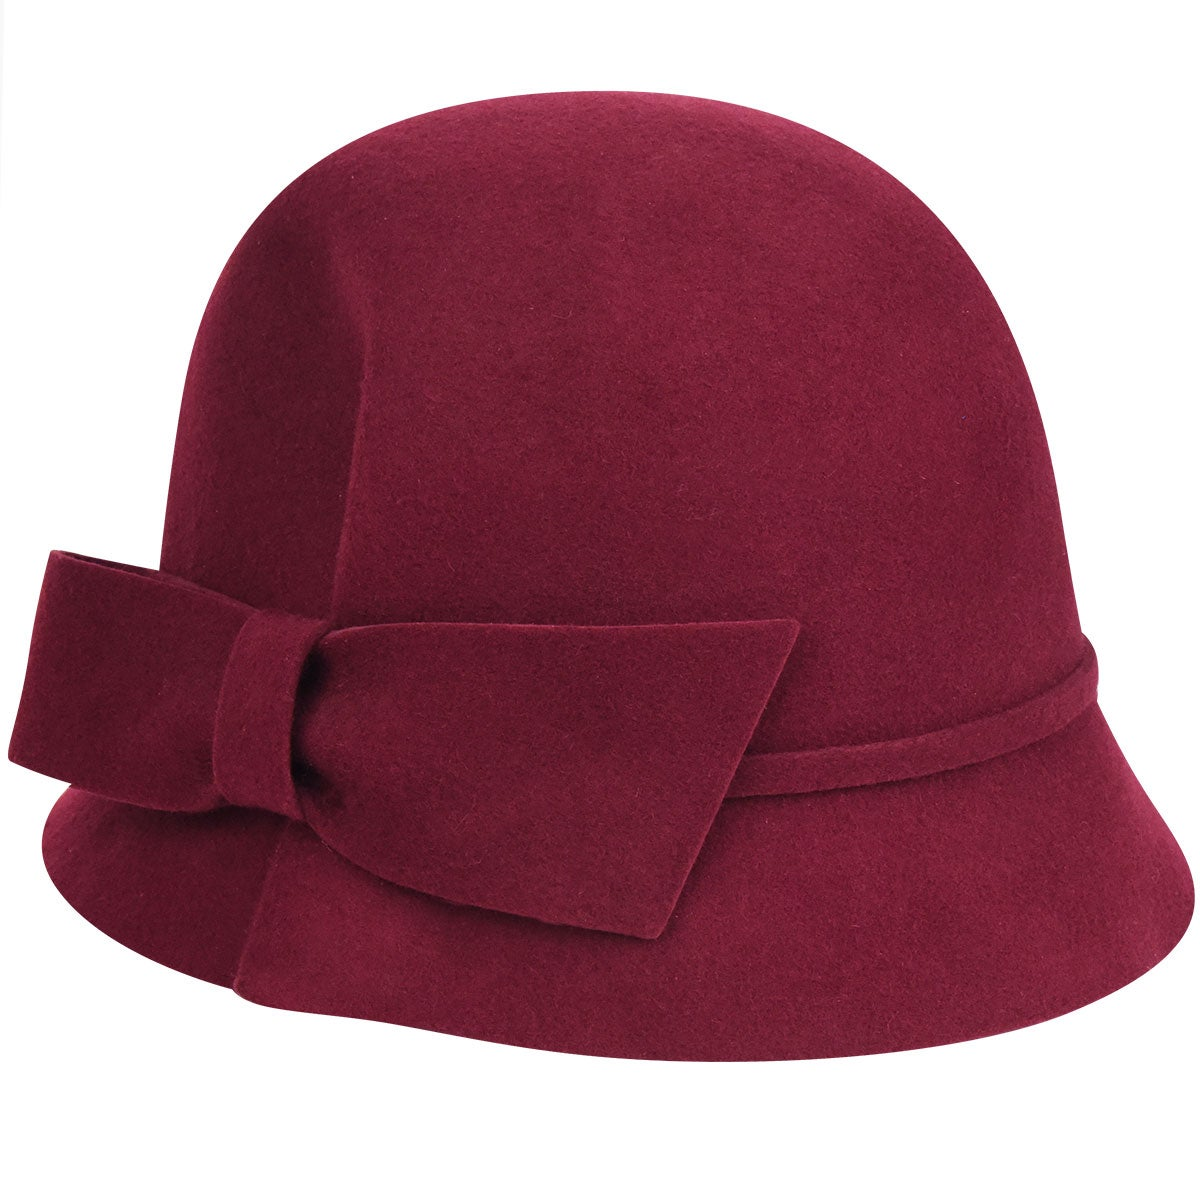 1930s Style Hats | Buy 30s Ladies Hats Dixie Cloche $60.00 AT vintagedancer.com